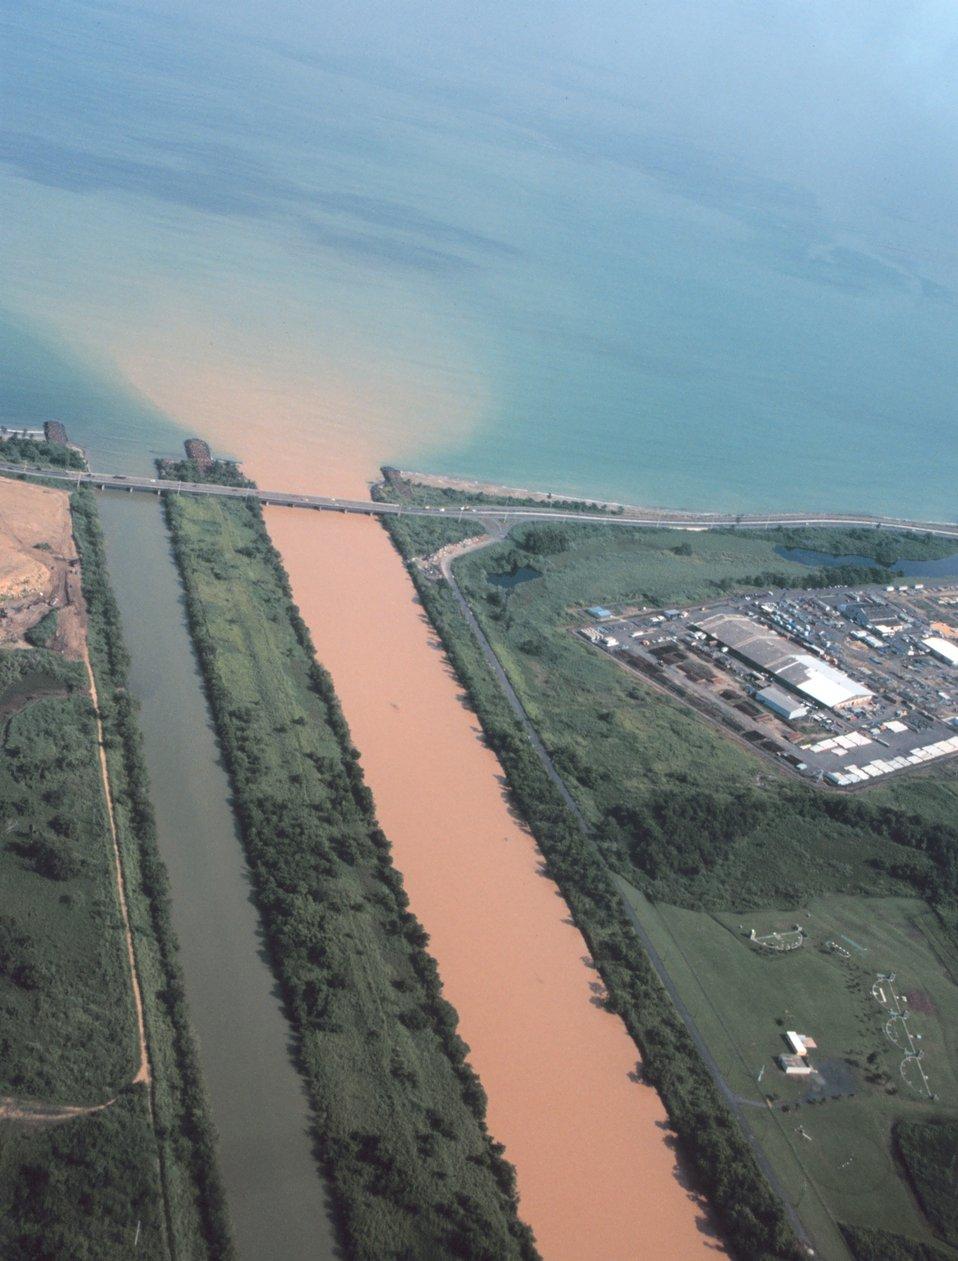 A heavily silted river enters the ocean near San Juan